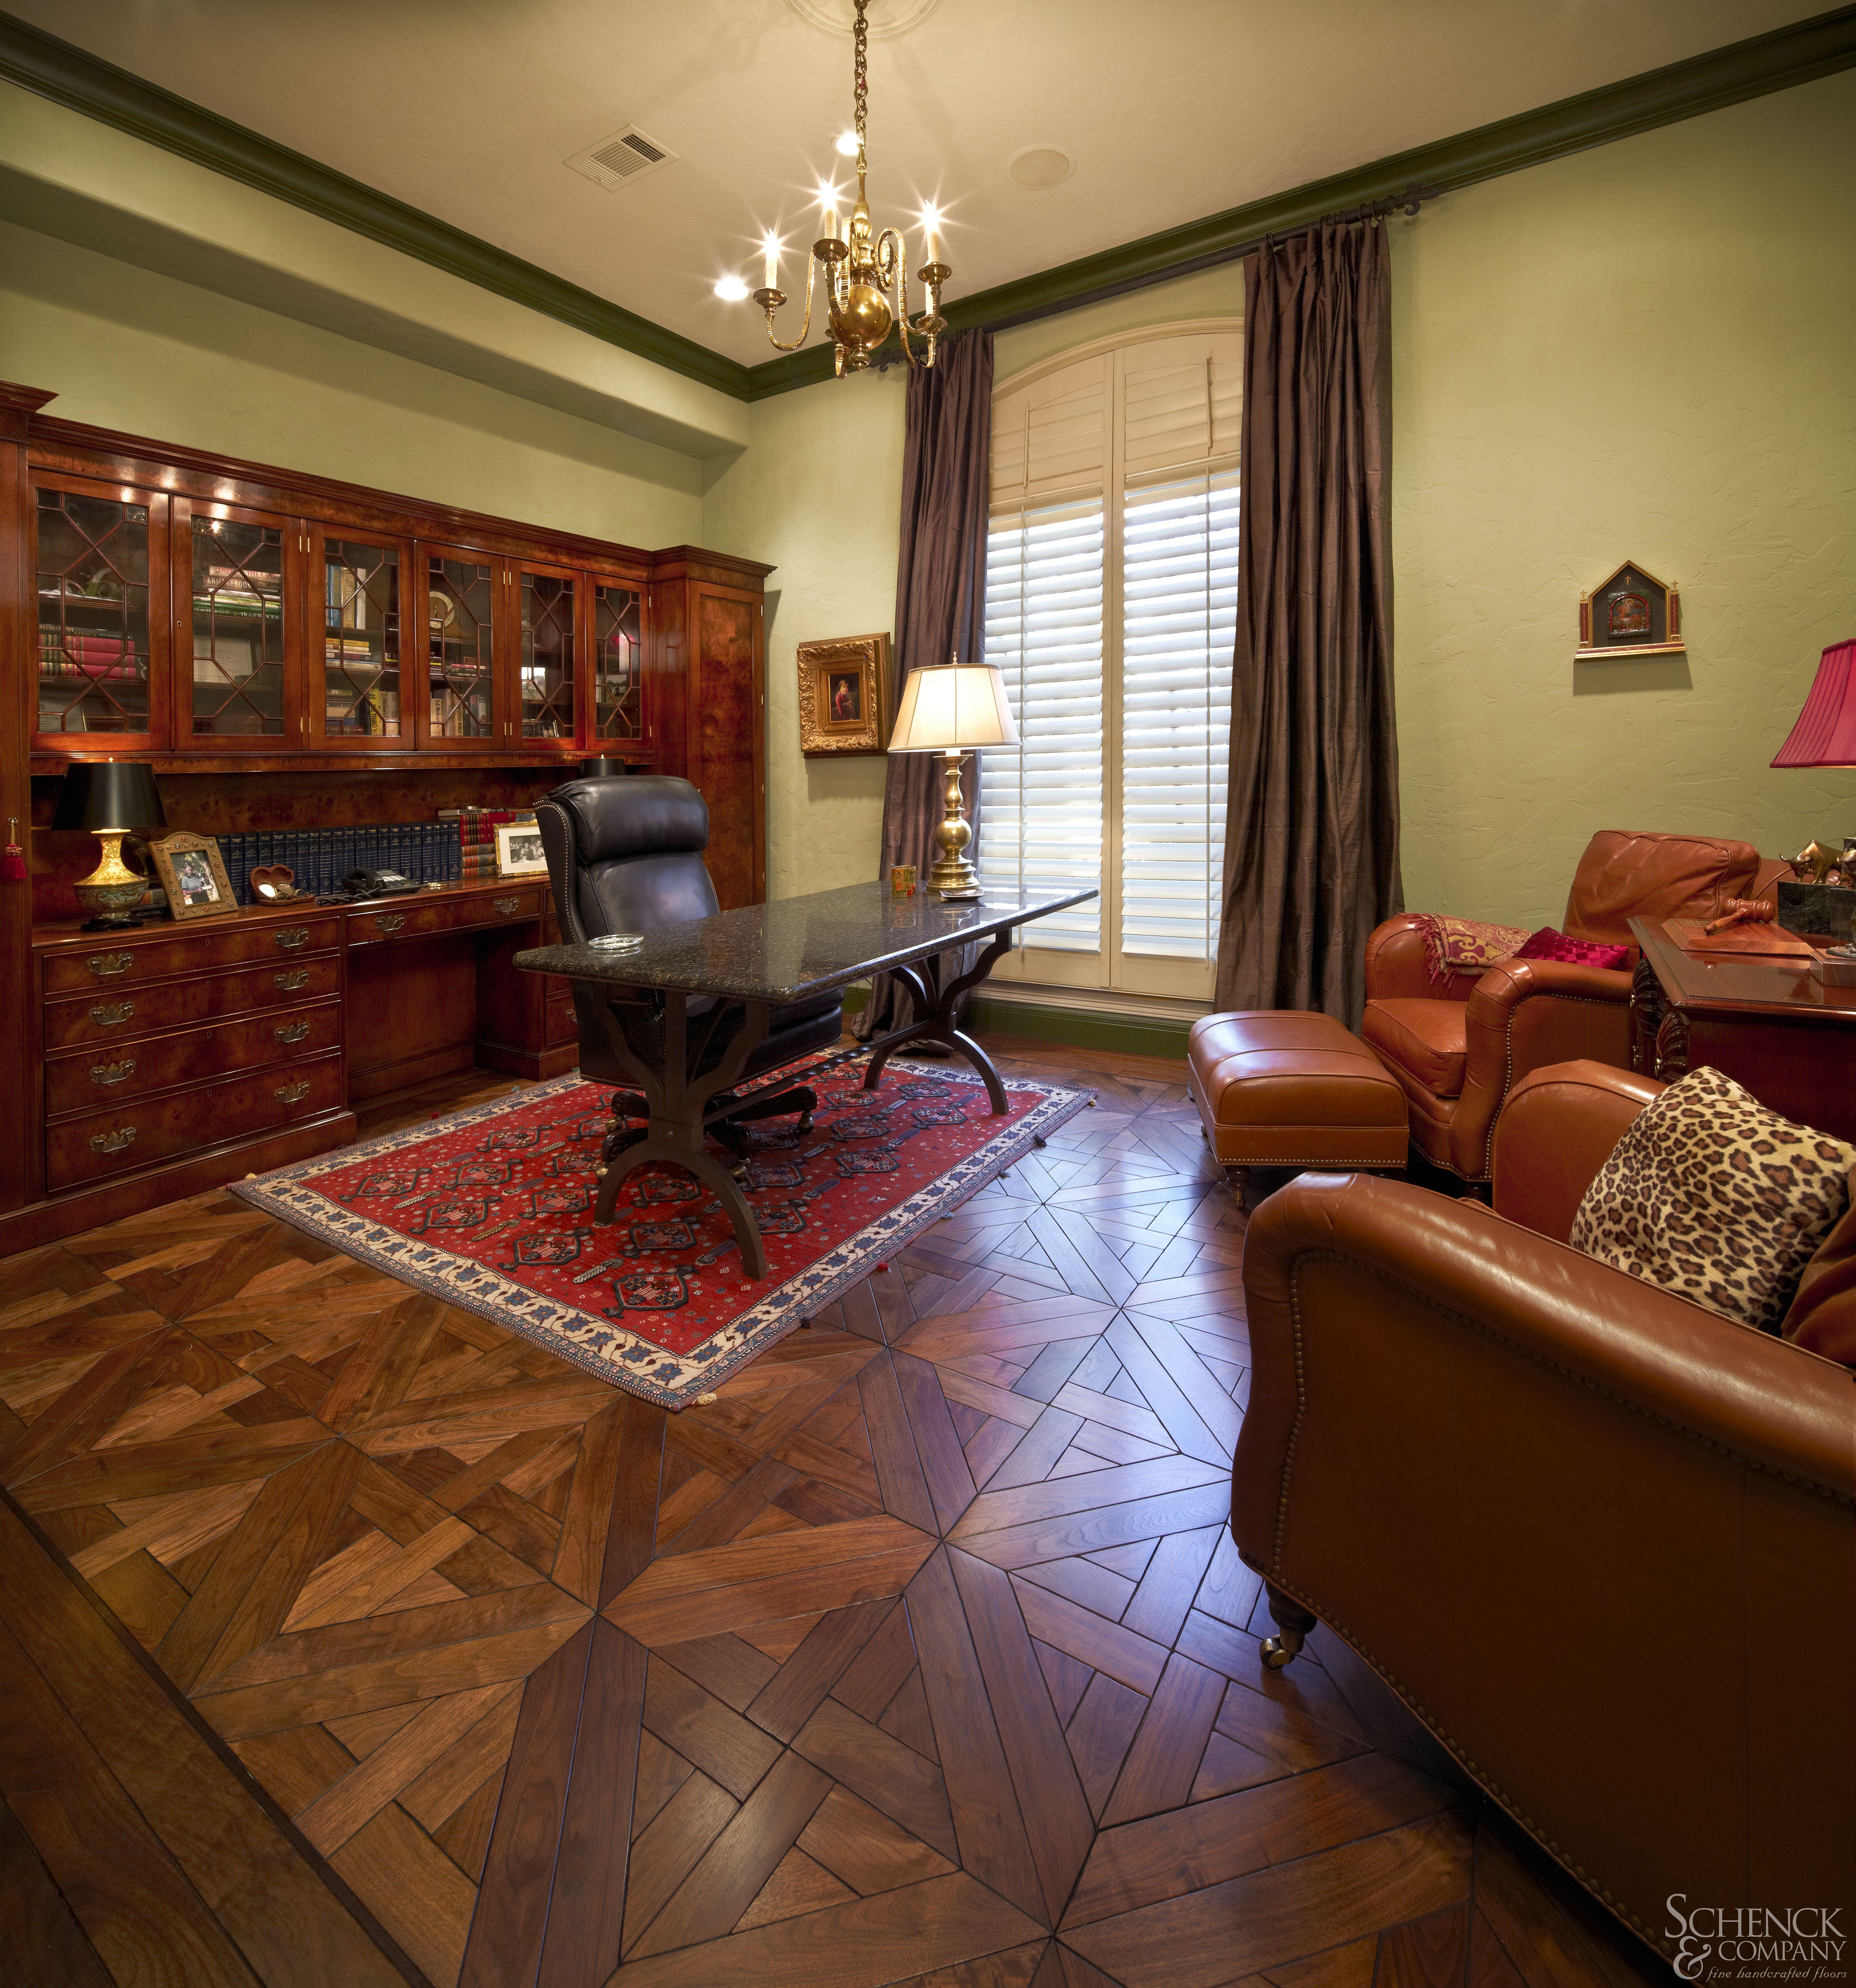 By Schenck And Company: #hardwoodflooring #hardwood #flooring #walnut #office